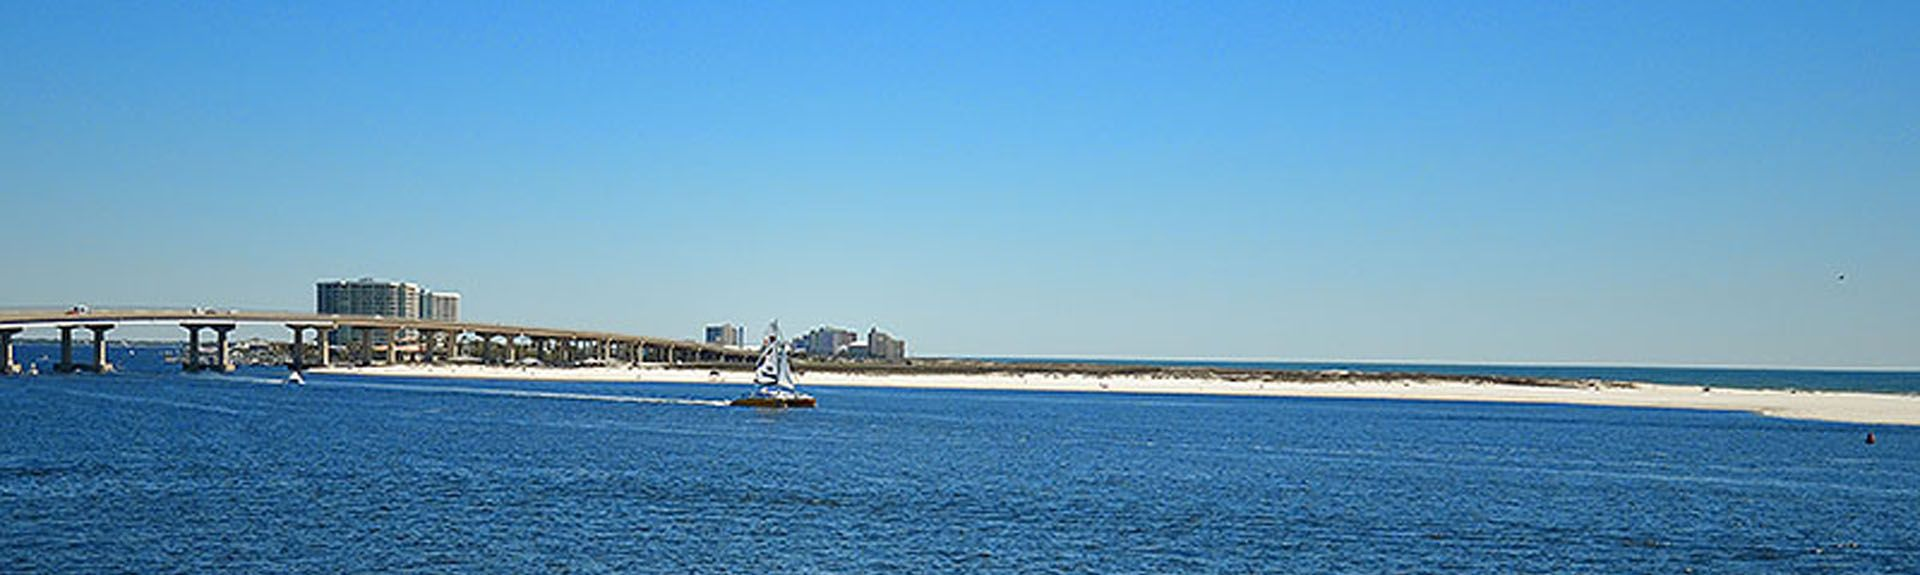 Grand Pointe (Orange Beach, Alabama, United States)